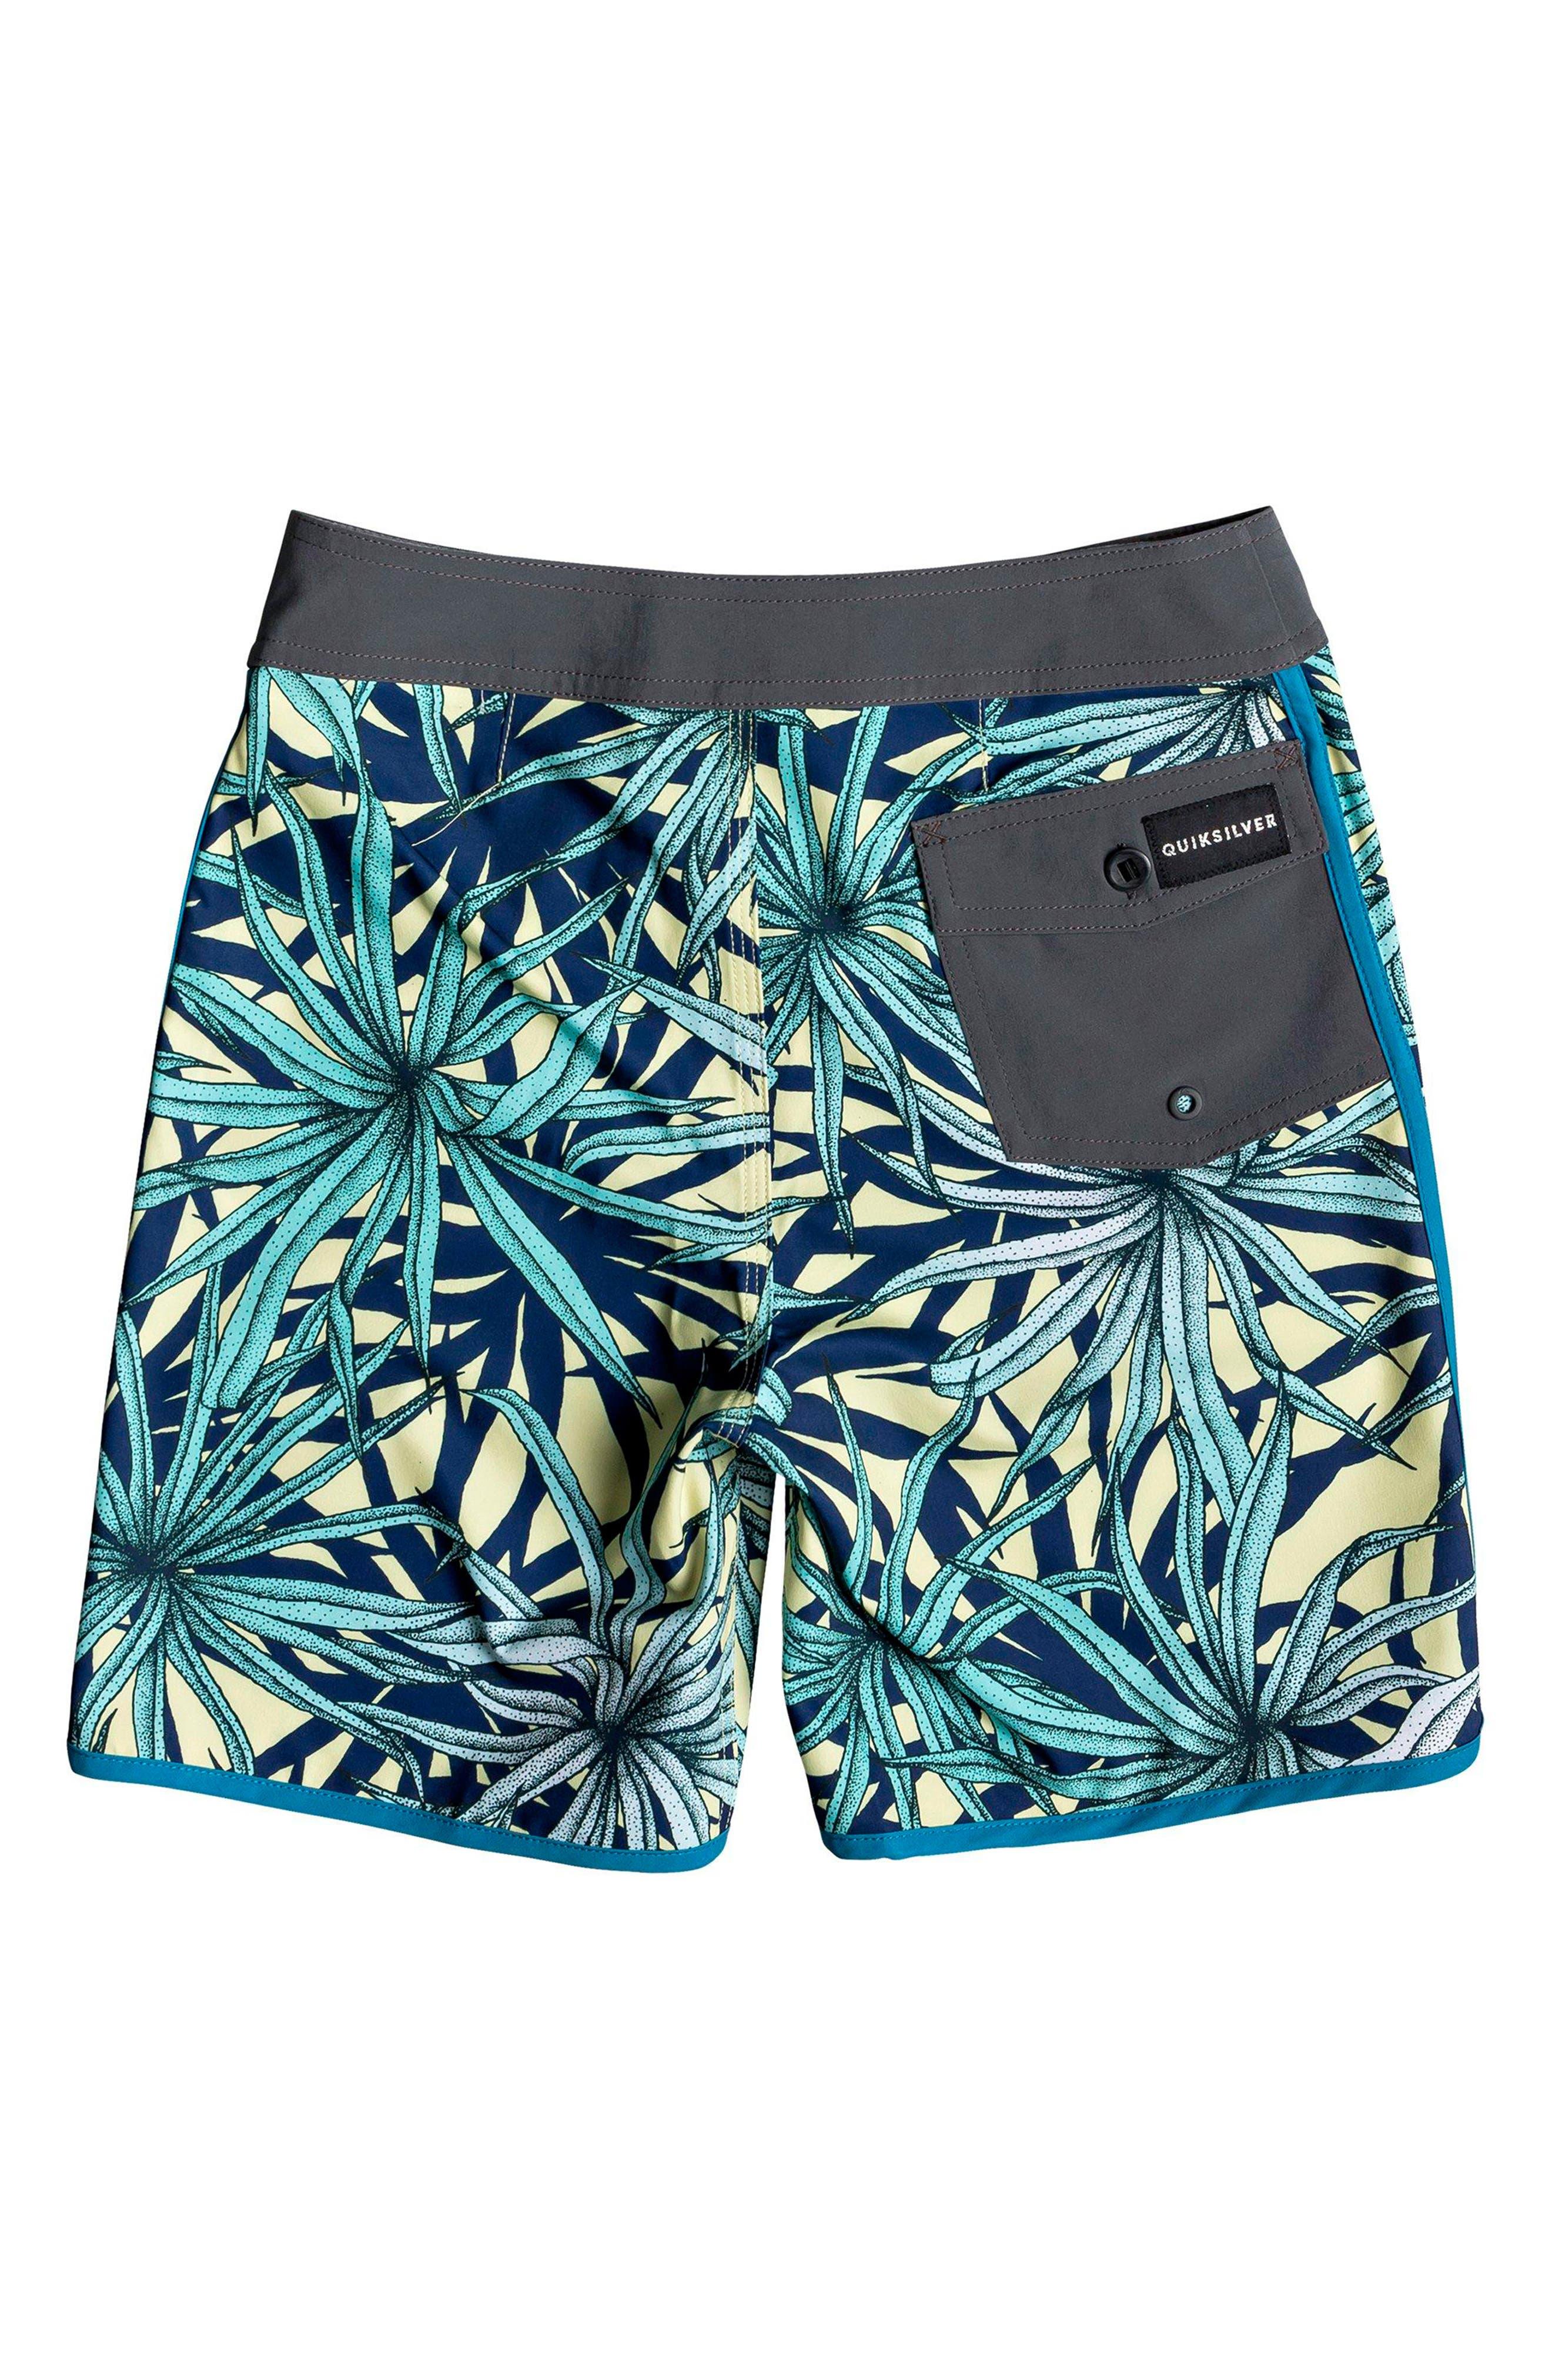 3e3467cd4b Big Boys' Quiksilver Swim Trunks: Board Shorts and Rashguards | Nordstrom